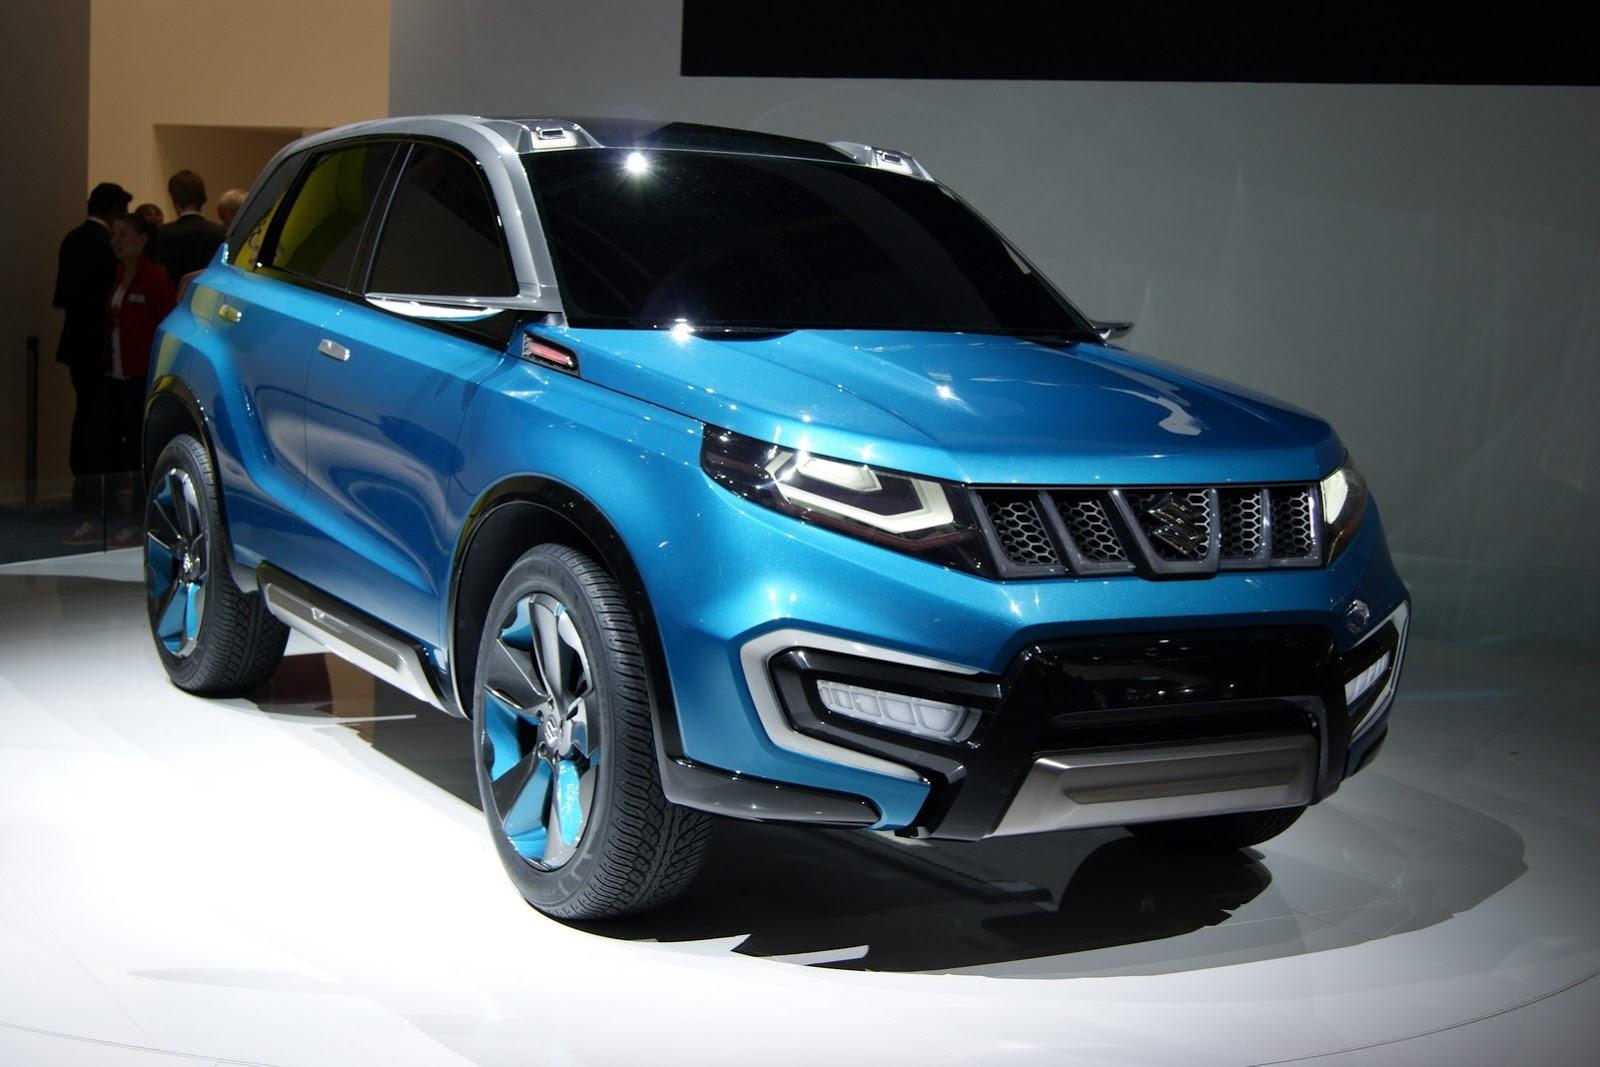 Suzuki-iv4-Compact-Suv